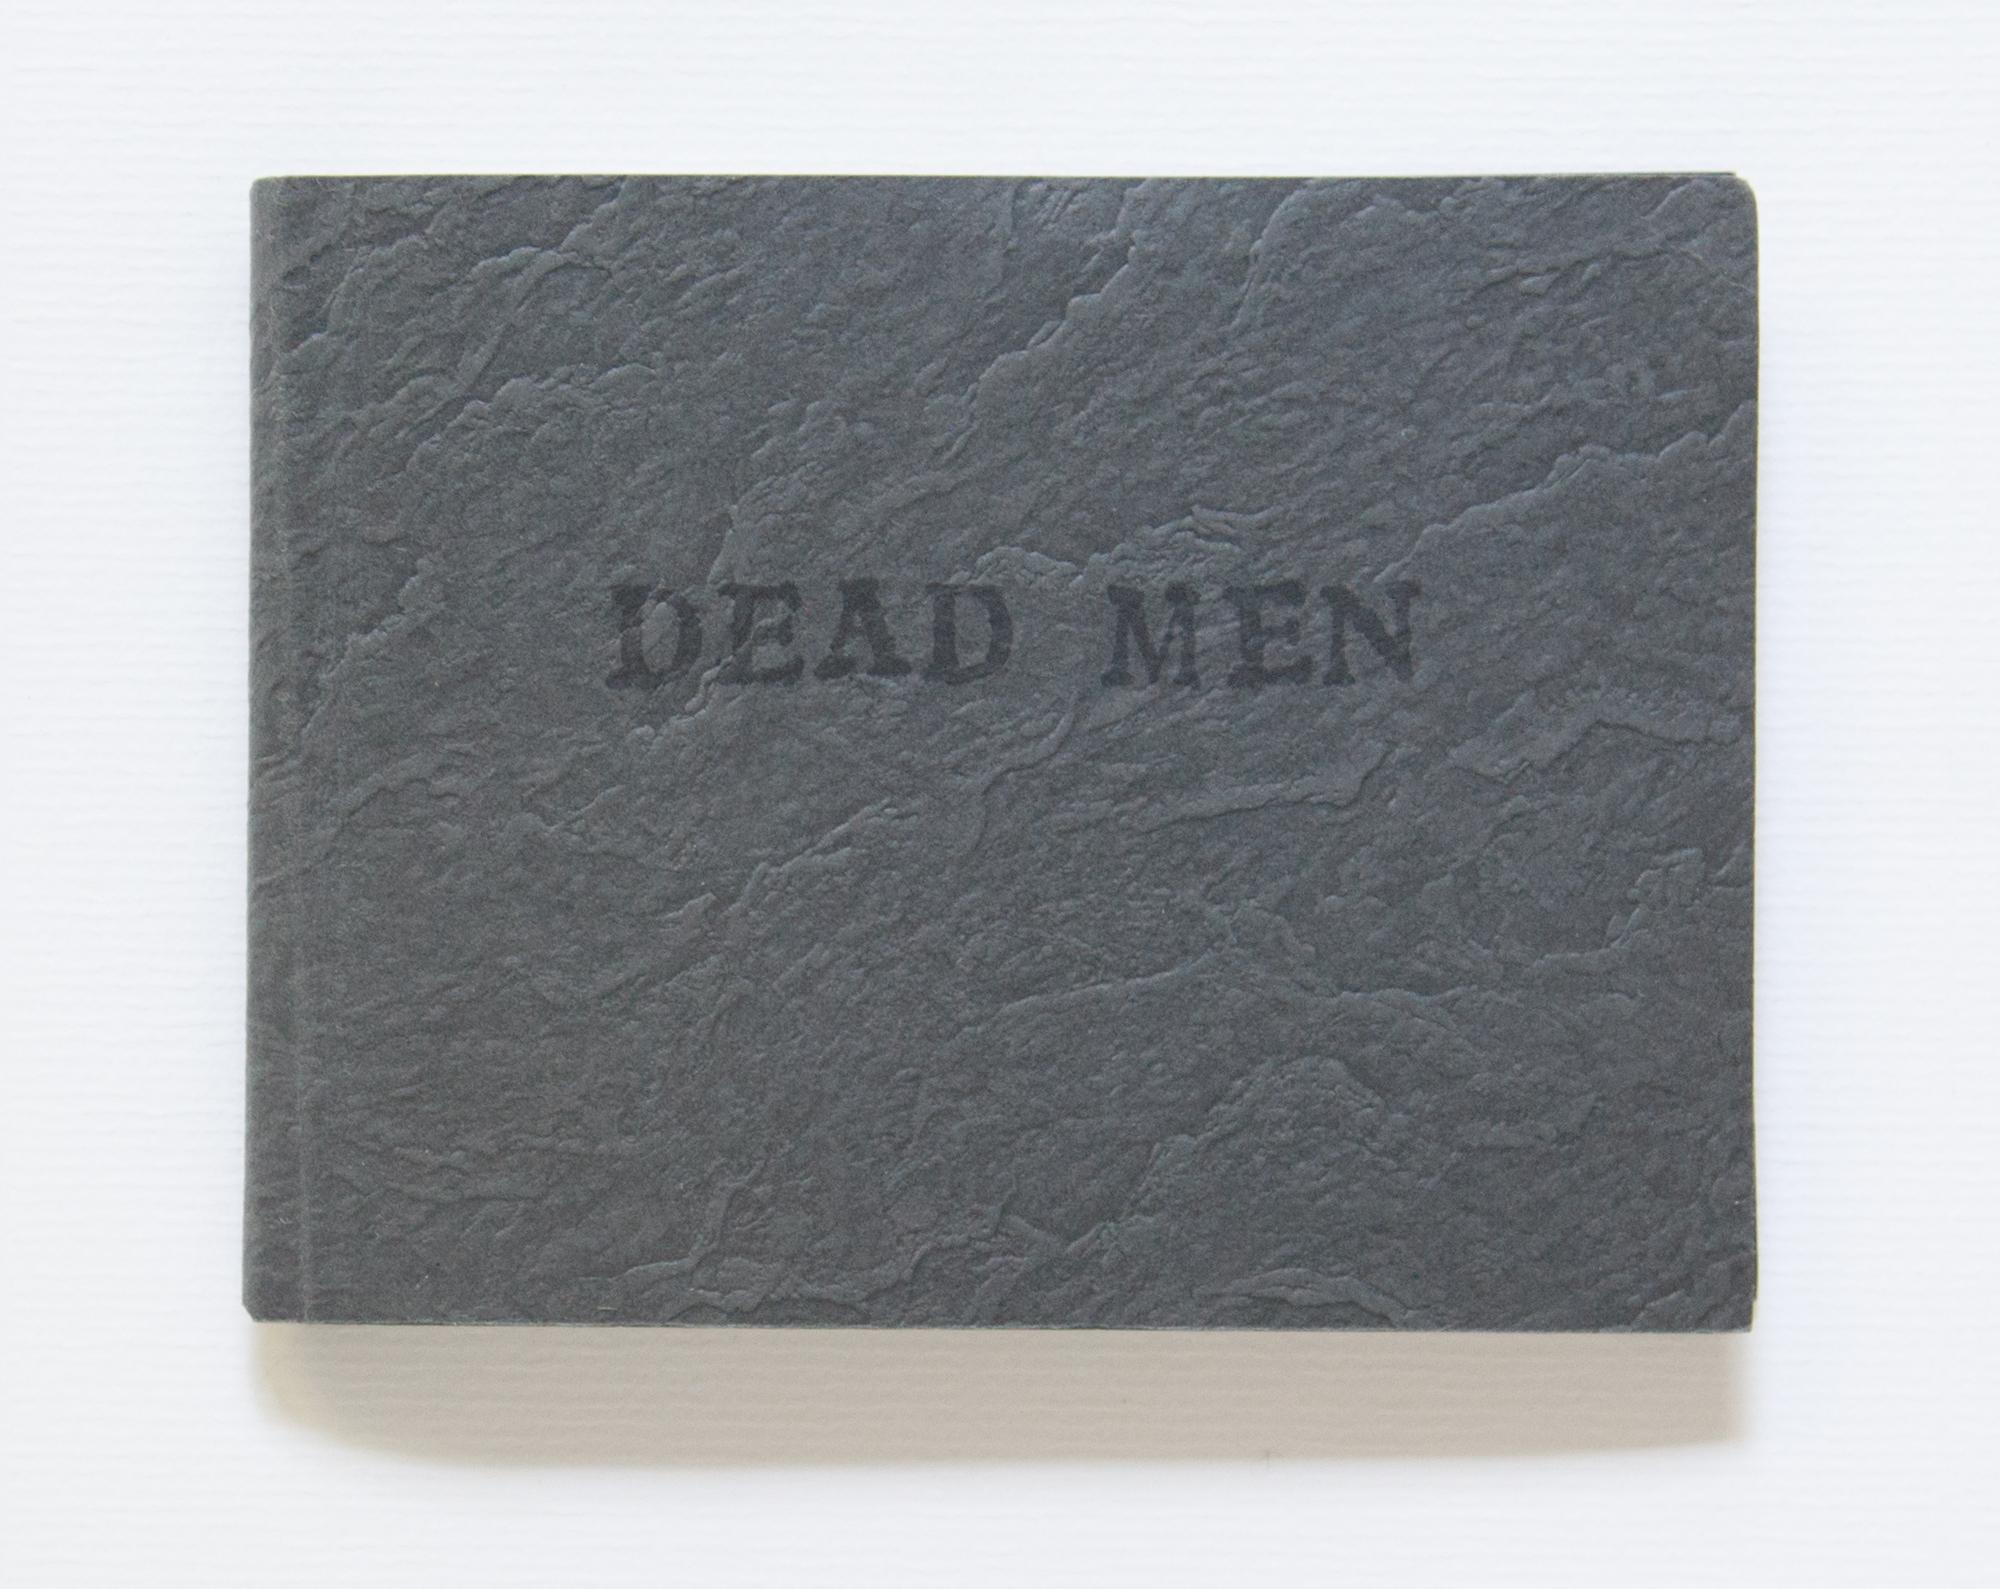 171_Dea Men (cover)_.jpg